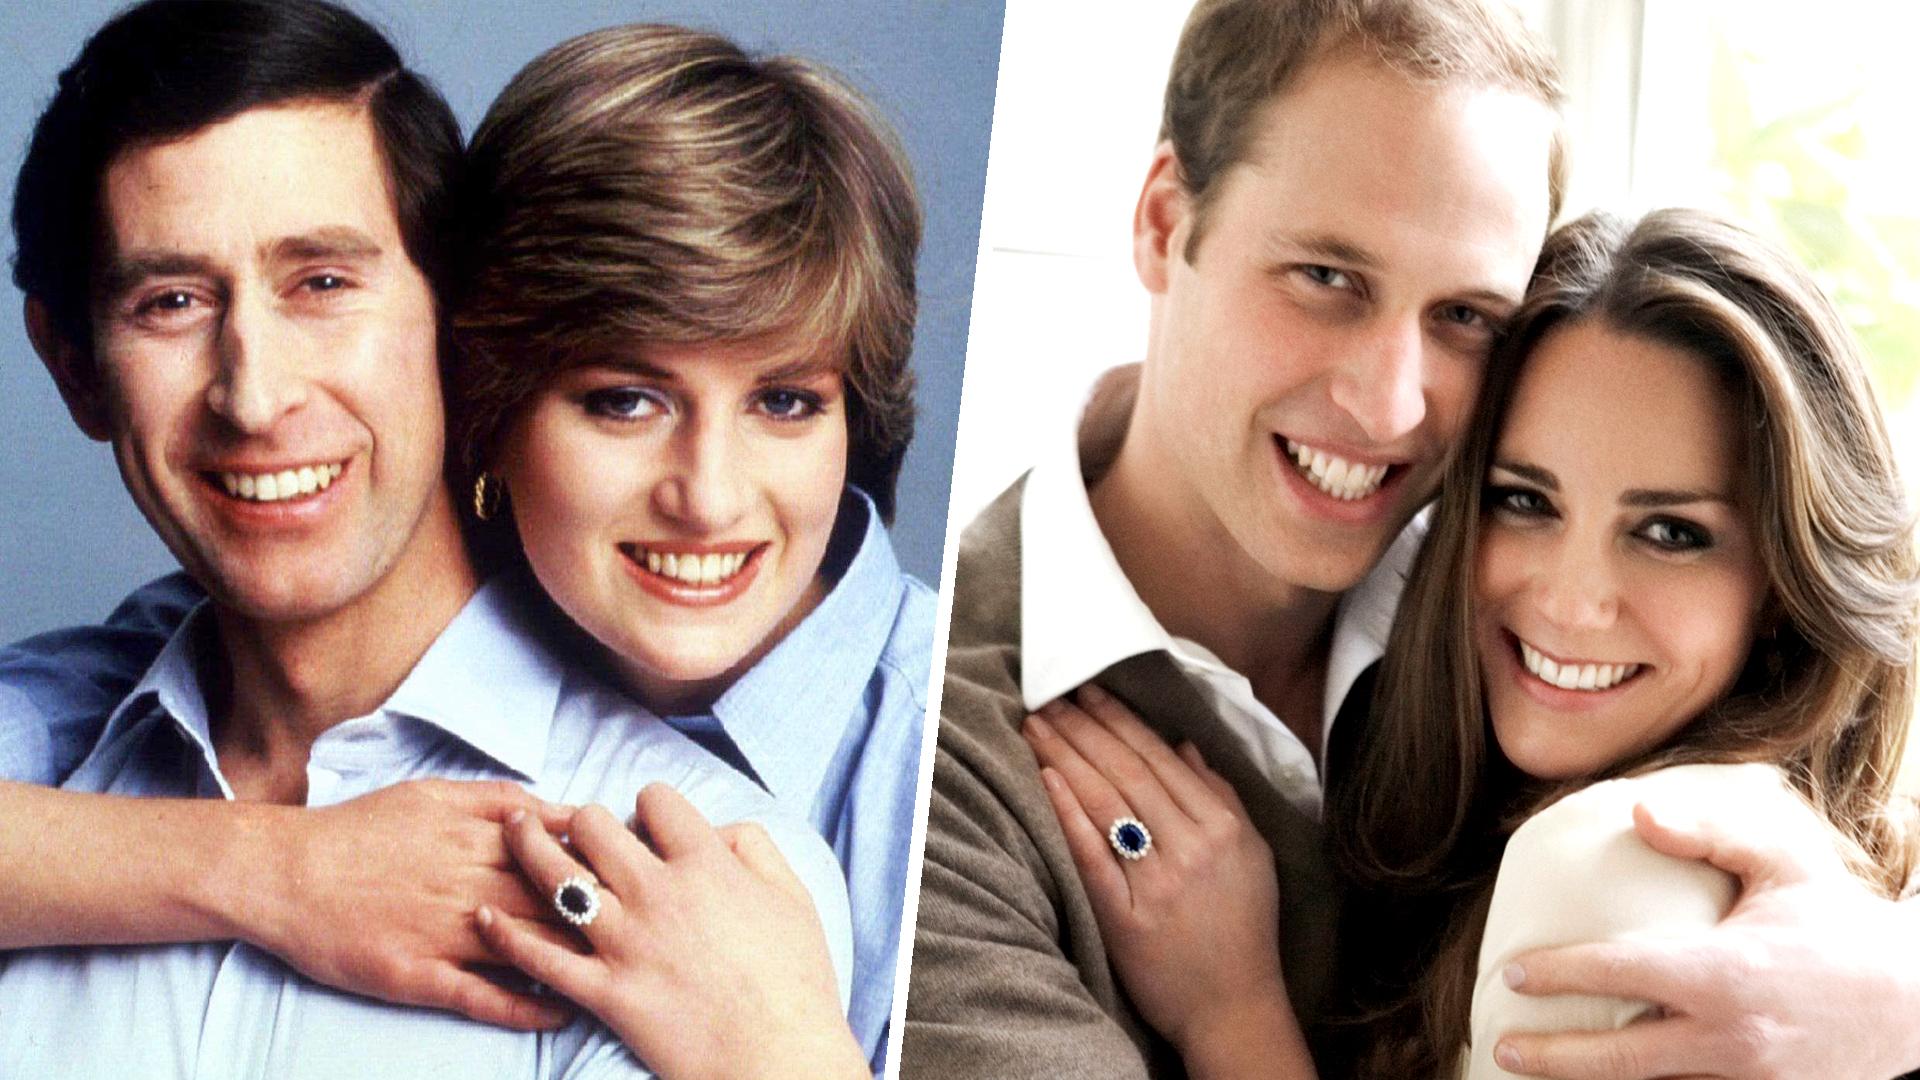 21 Times Kate Middleton Dressed Like Princess Diana Images, Photos, Reviews